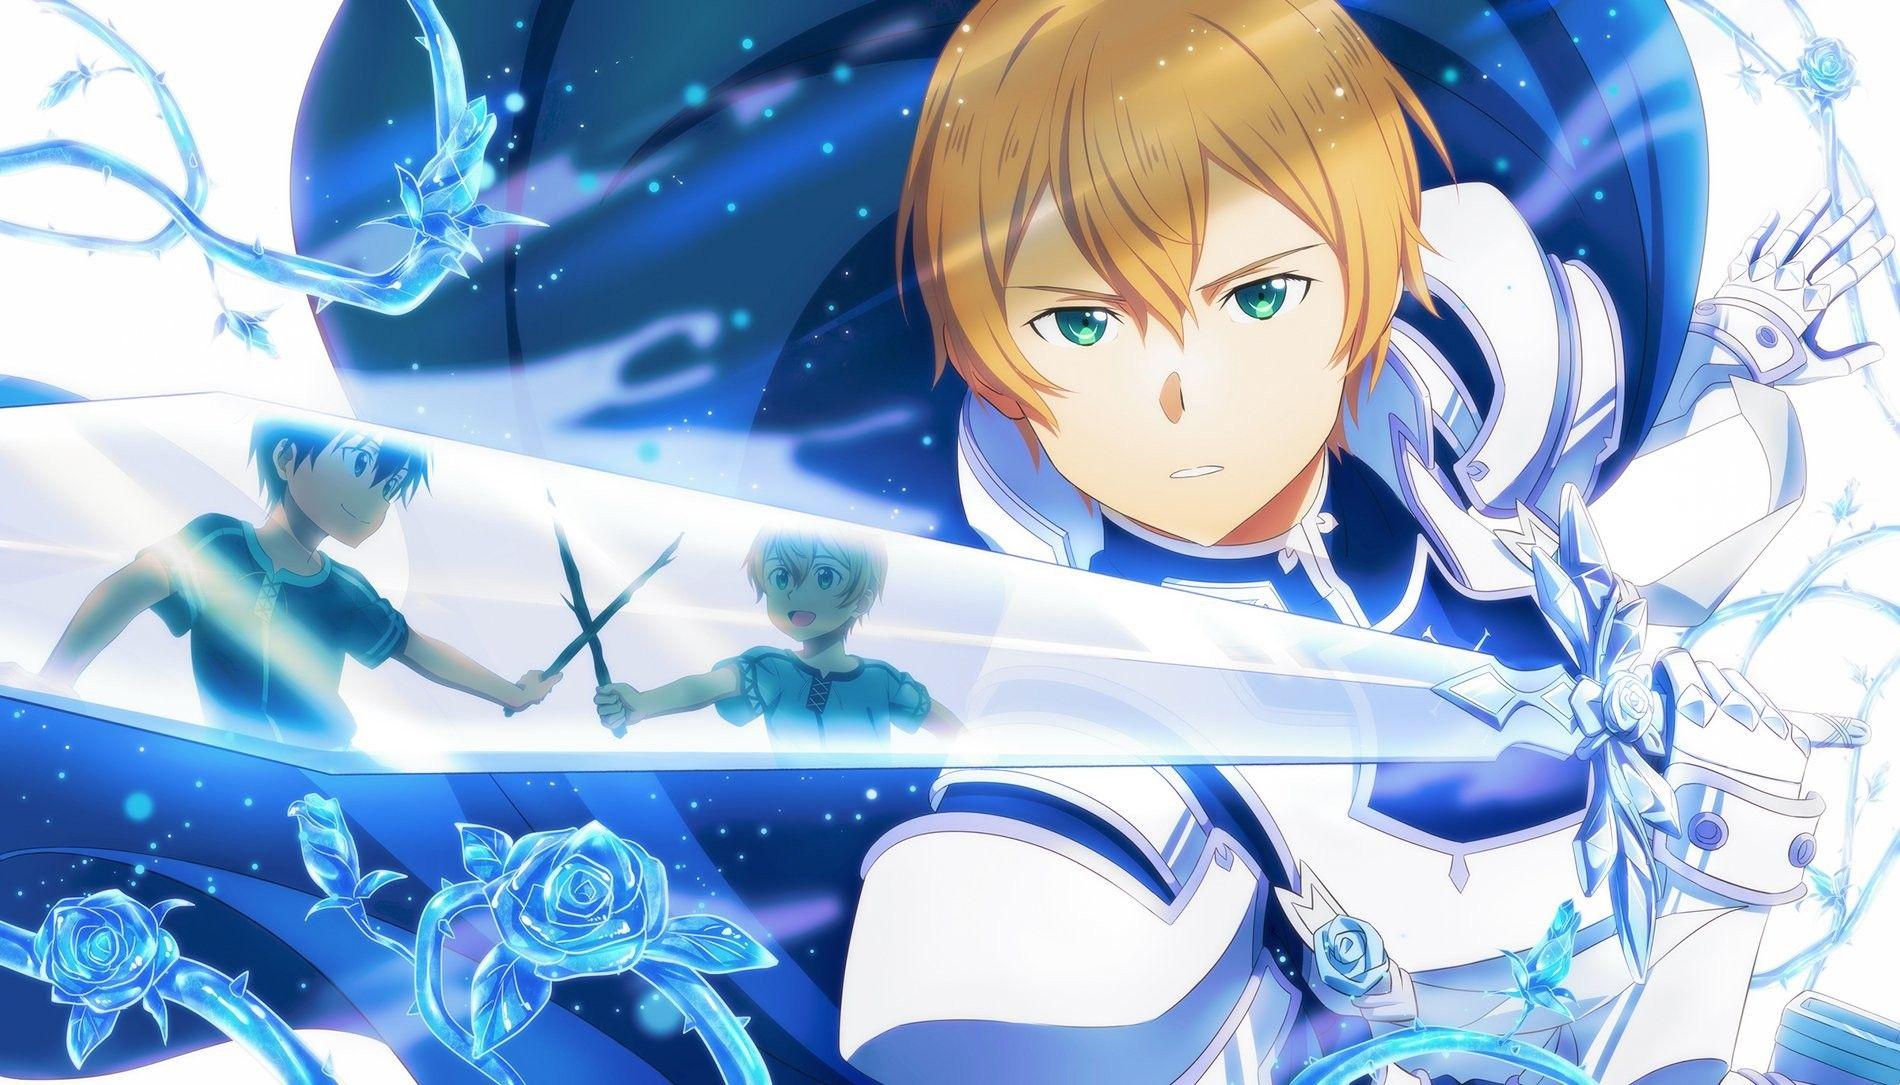 Pin de Nur Fajrin em ZEKKEN Personagens de anime, Animes